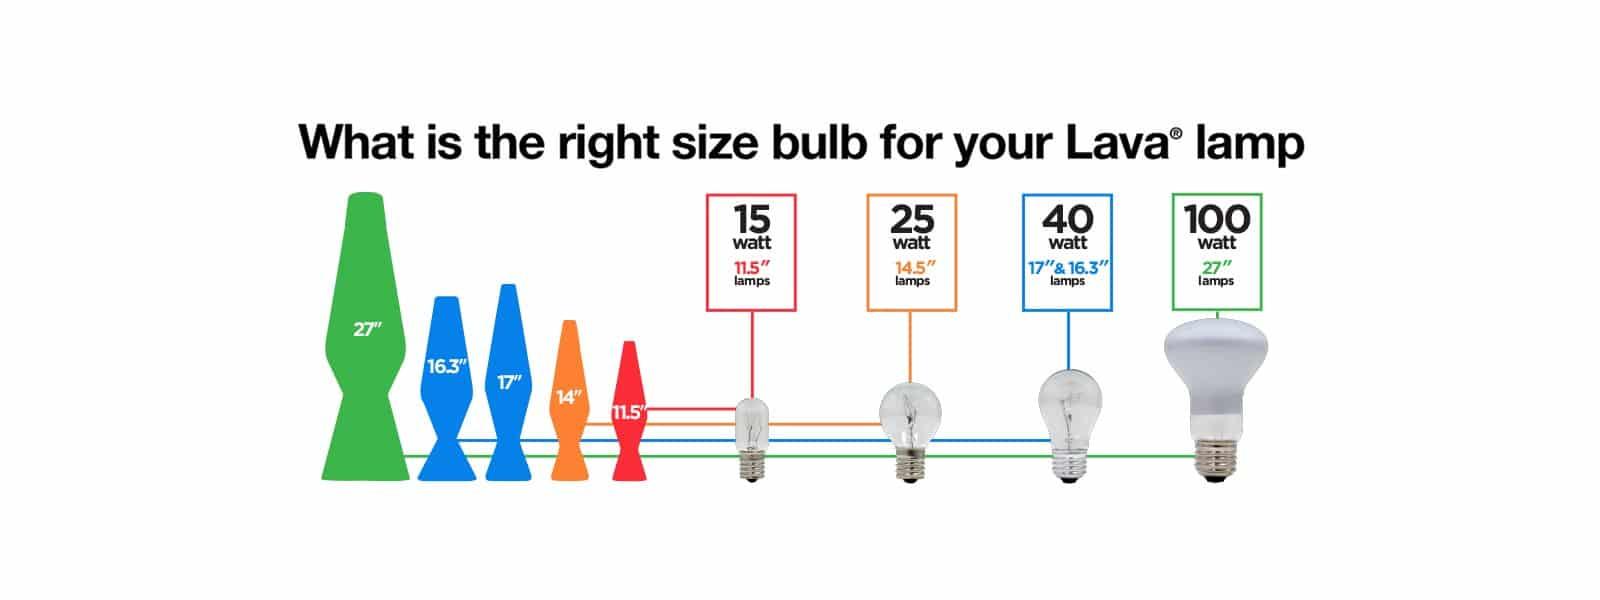 Lava Lamp Light Bulbs, Parts, & Accessories | Lava Lamp